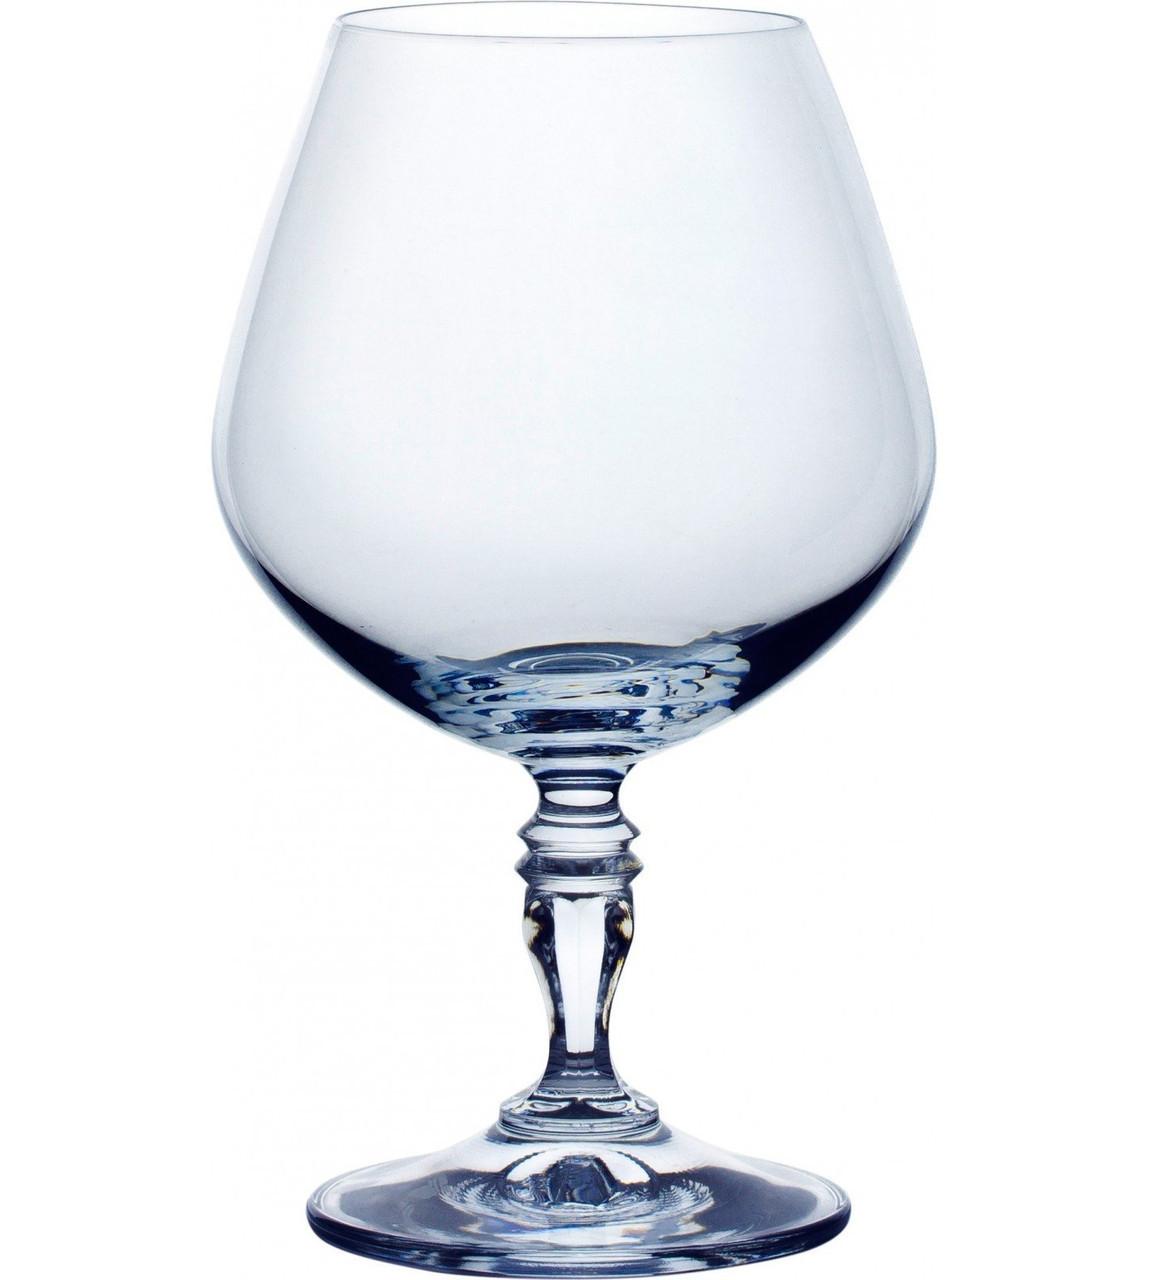 Набор бокалов для коньяка (380 мл/6шт.) BOHEMIA Victoria b40727-159607